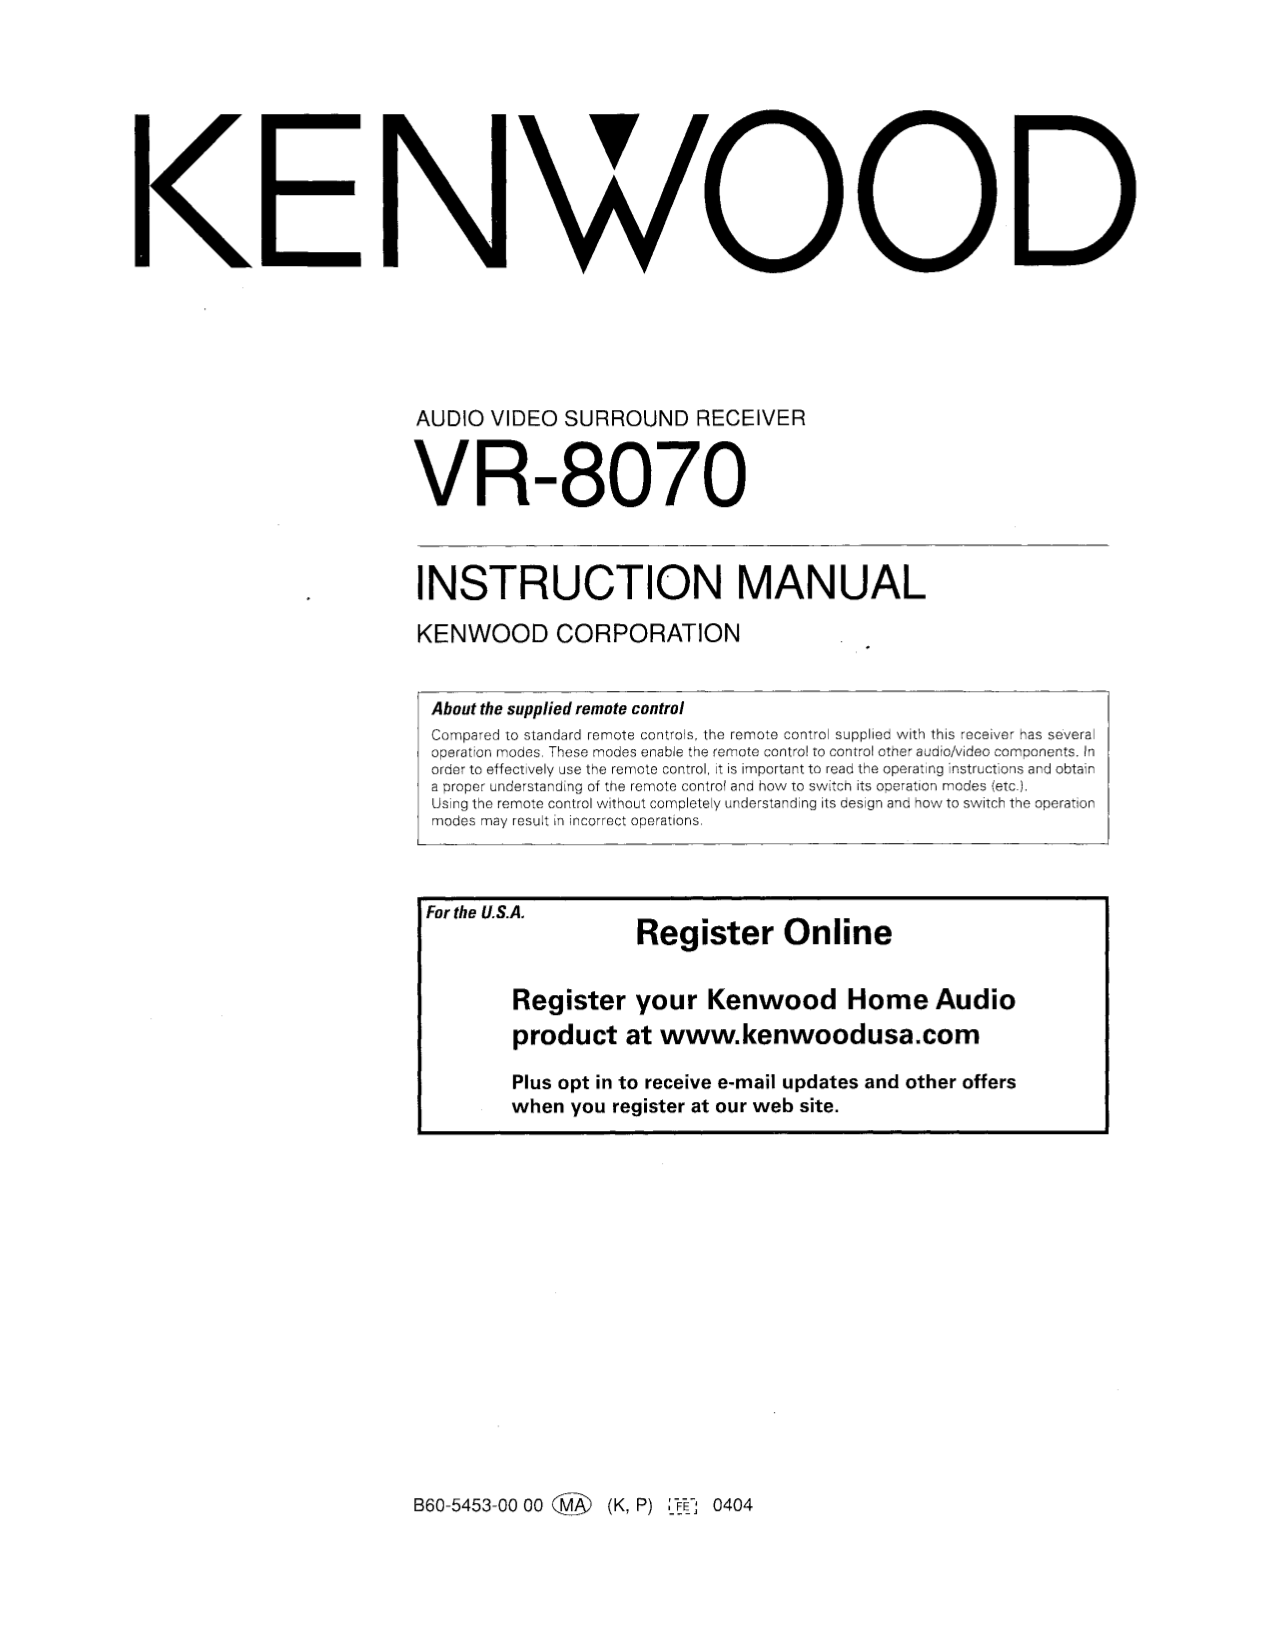 Emanualonline car workshop manuals, service manuals, repair.